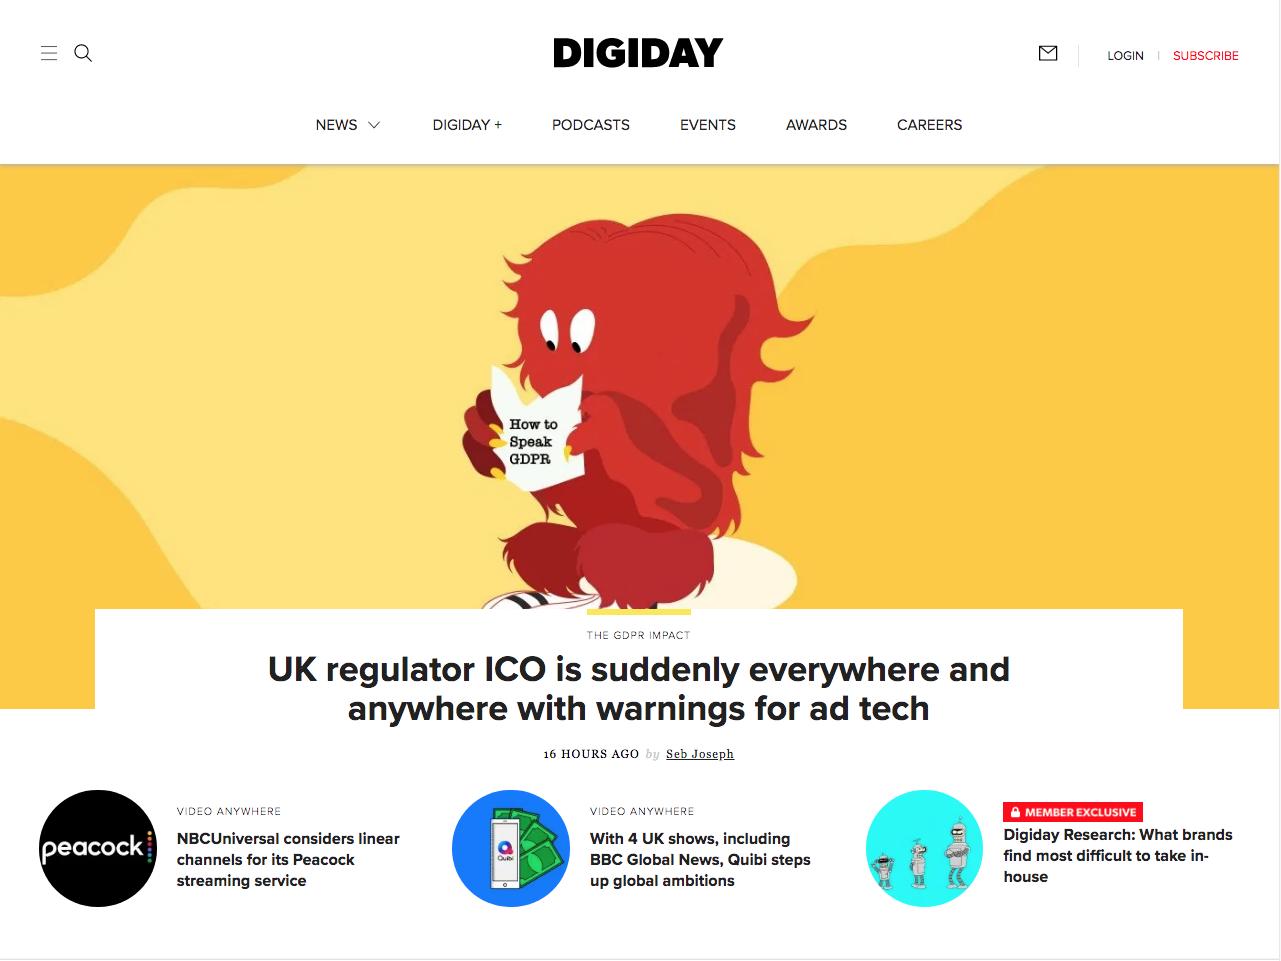 digiday-digital-marketing-news-site